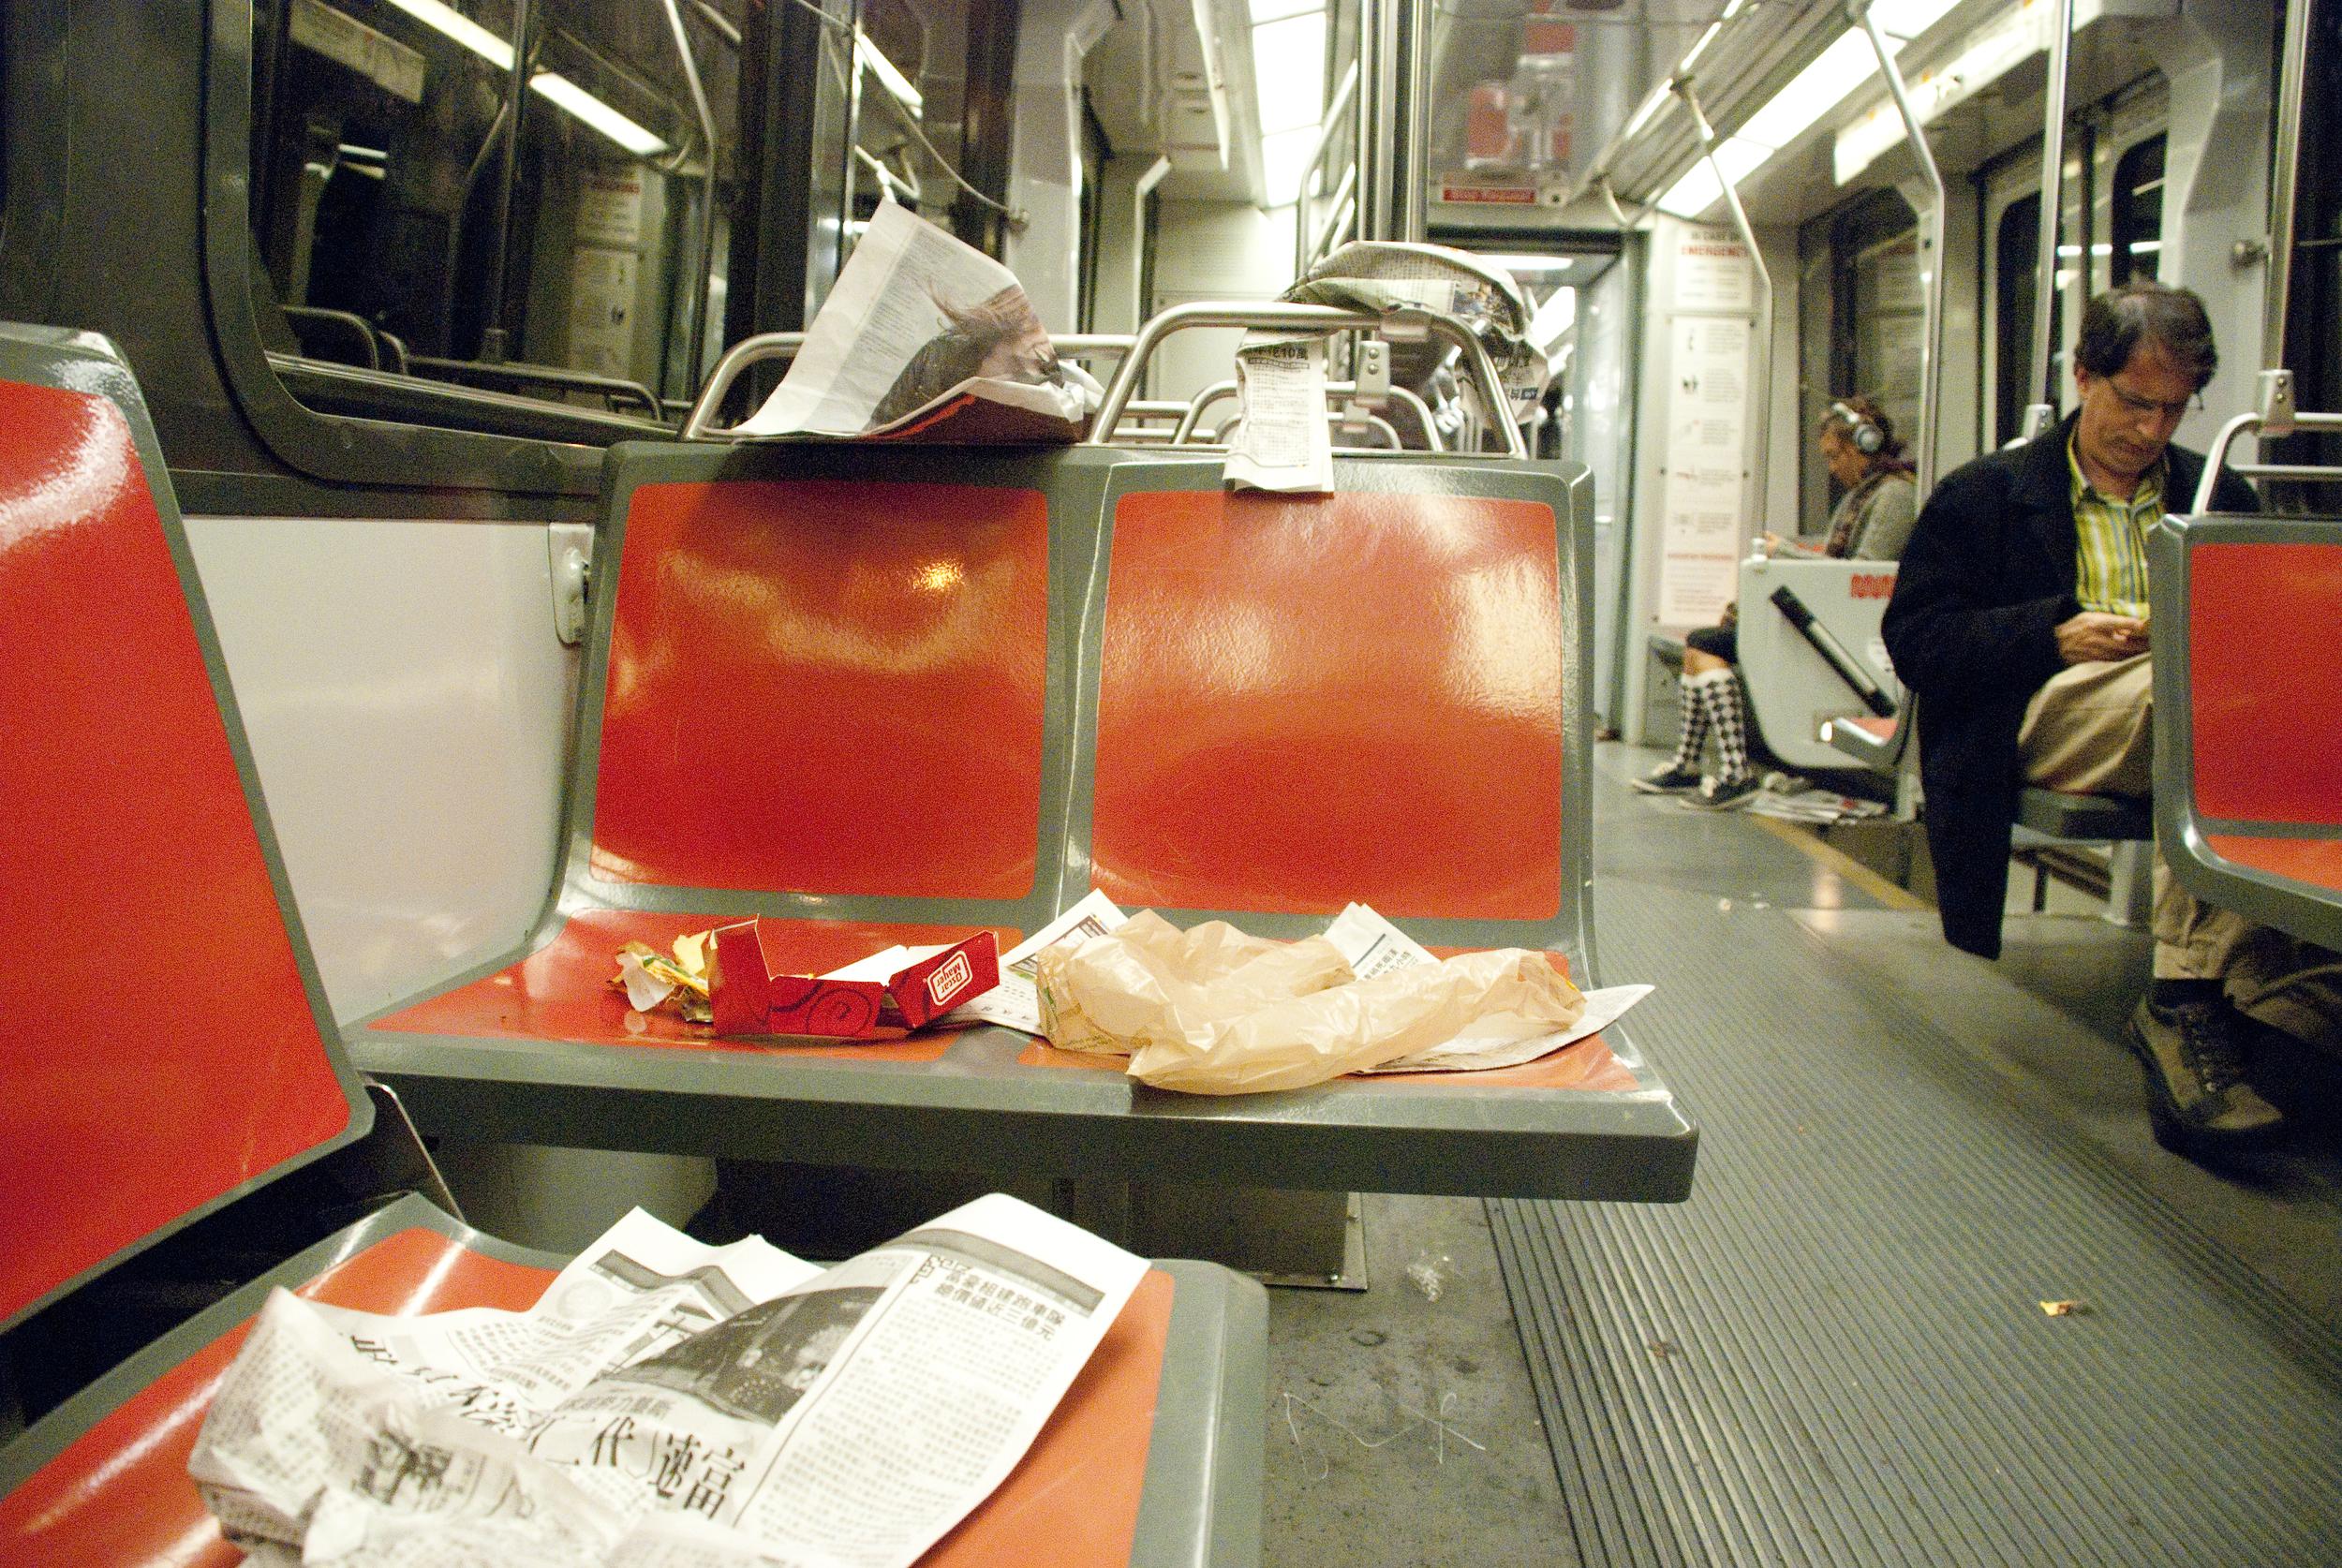 Trash is strewn across several seats on a Muni light rail train in San Francisco, Calif. Monday, Sept. 13, 2010.